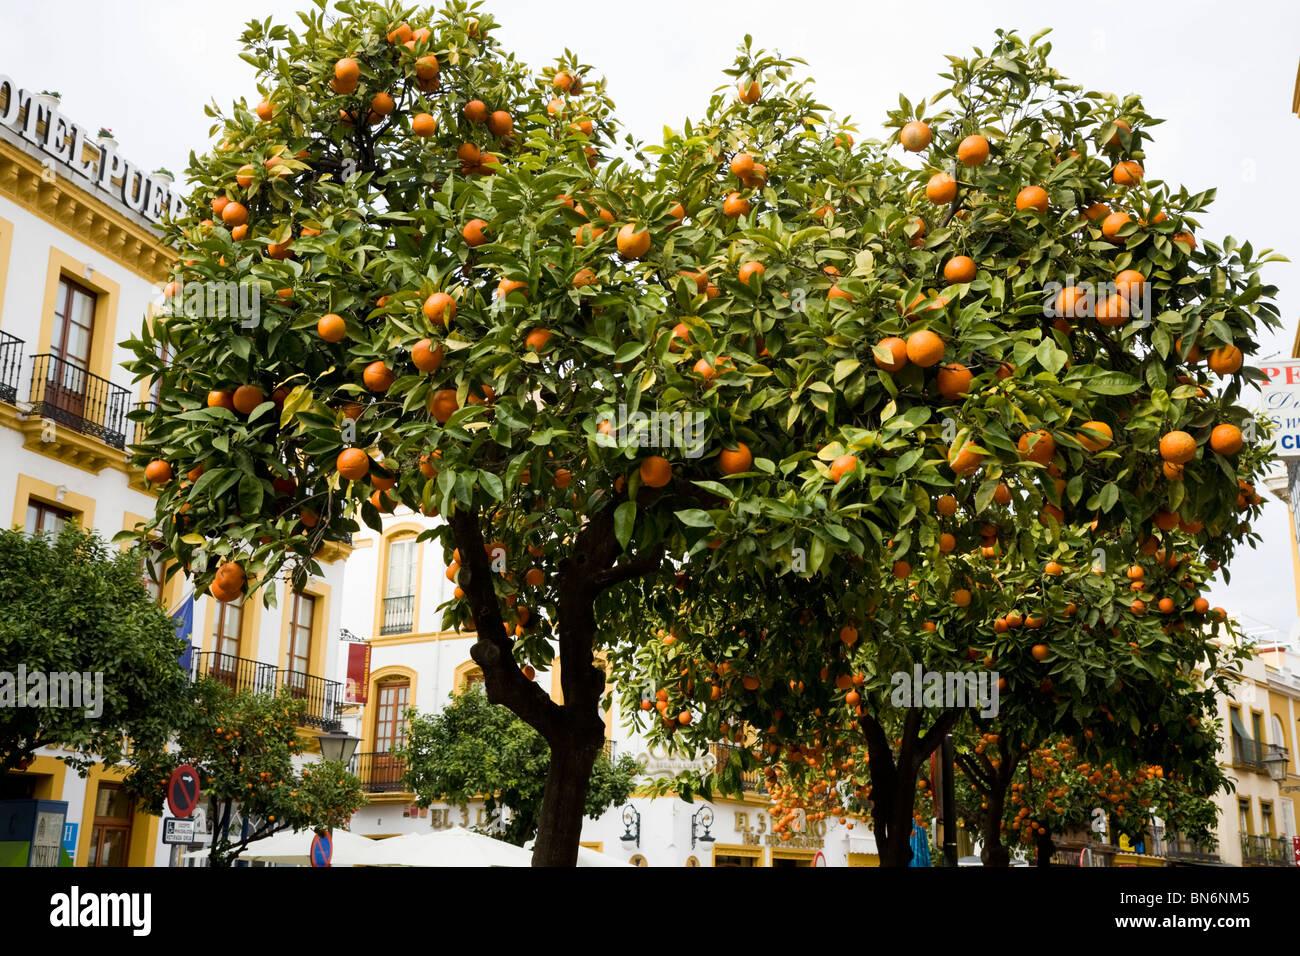 Fruiting orange fruit tree trees growing on the street - Orange en sevilla ...